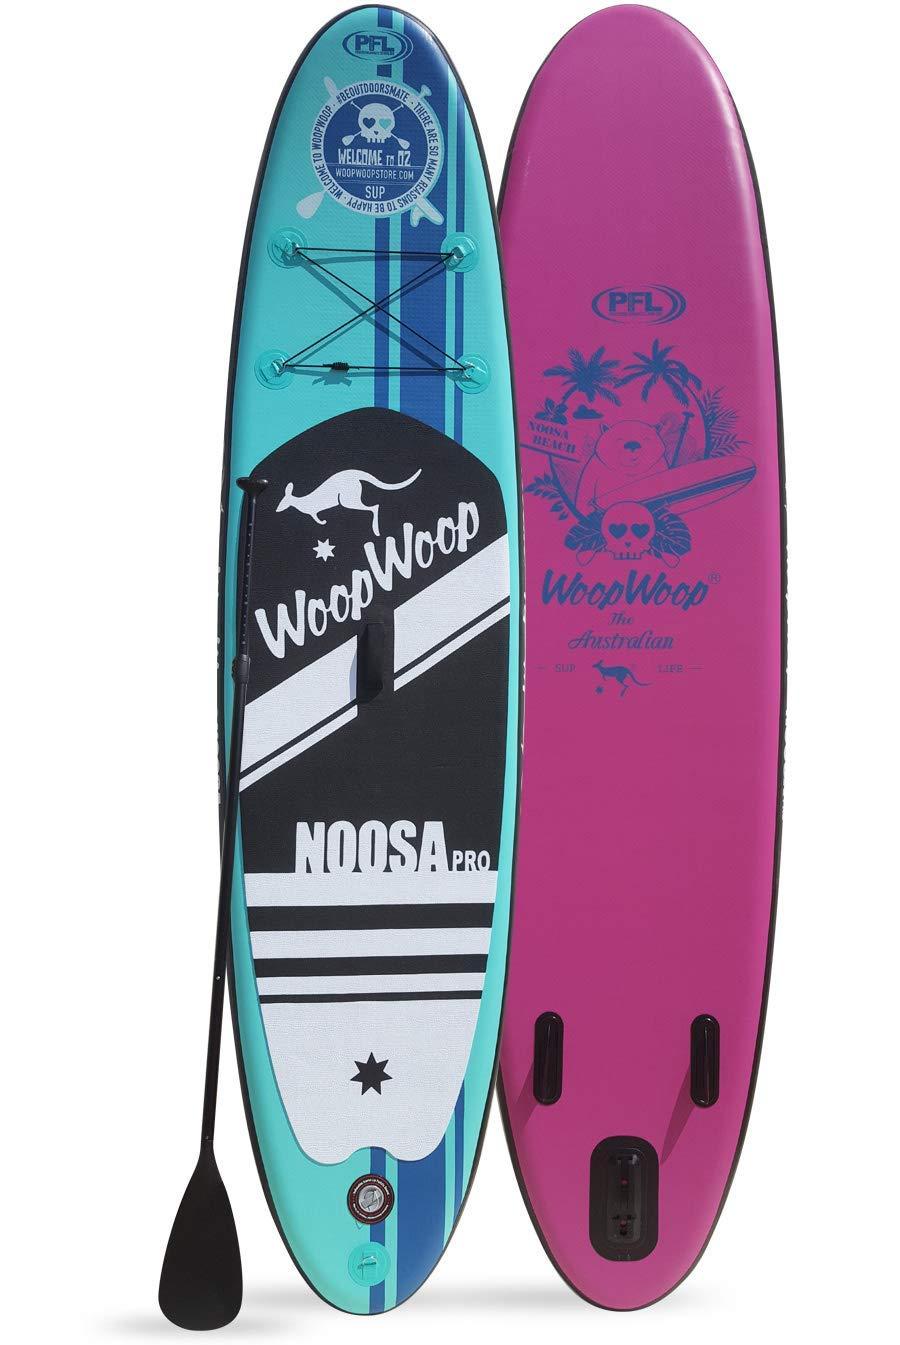 Woop Woop Tabla de Paddle Surf Hinchable Noosa Pro SUPRO95 ...